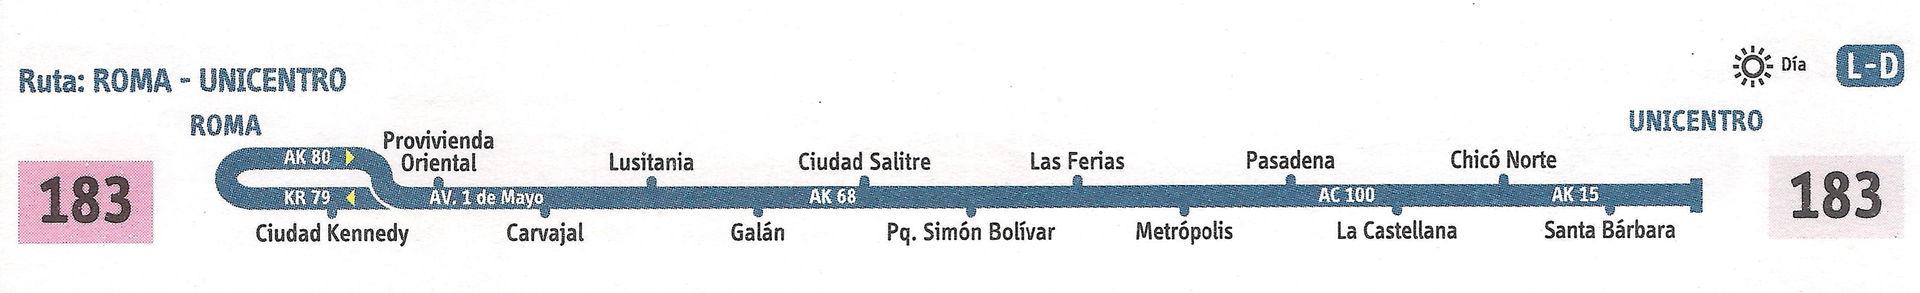 Ruta SITP: 183 Roma ↔ Unicentro (La Floresta) [Urbana] 2